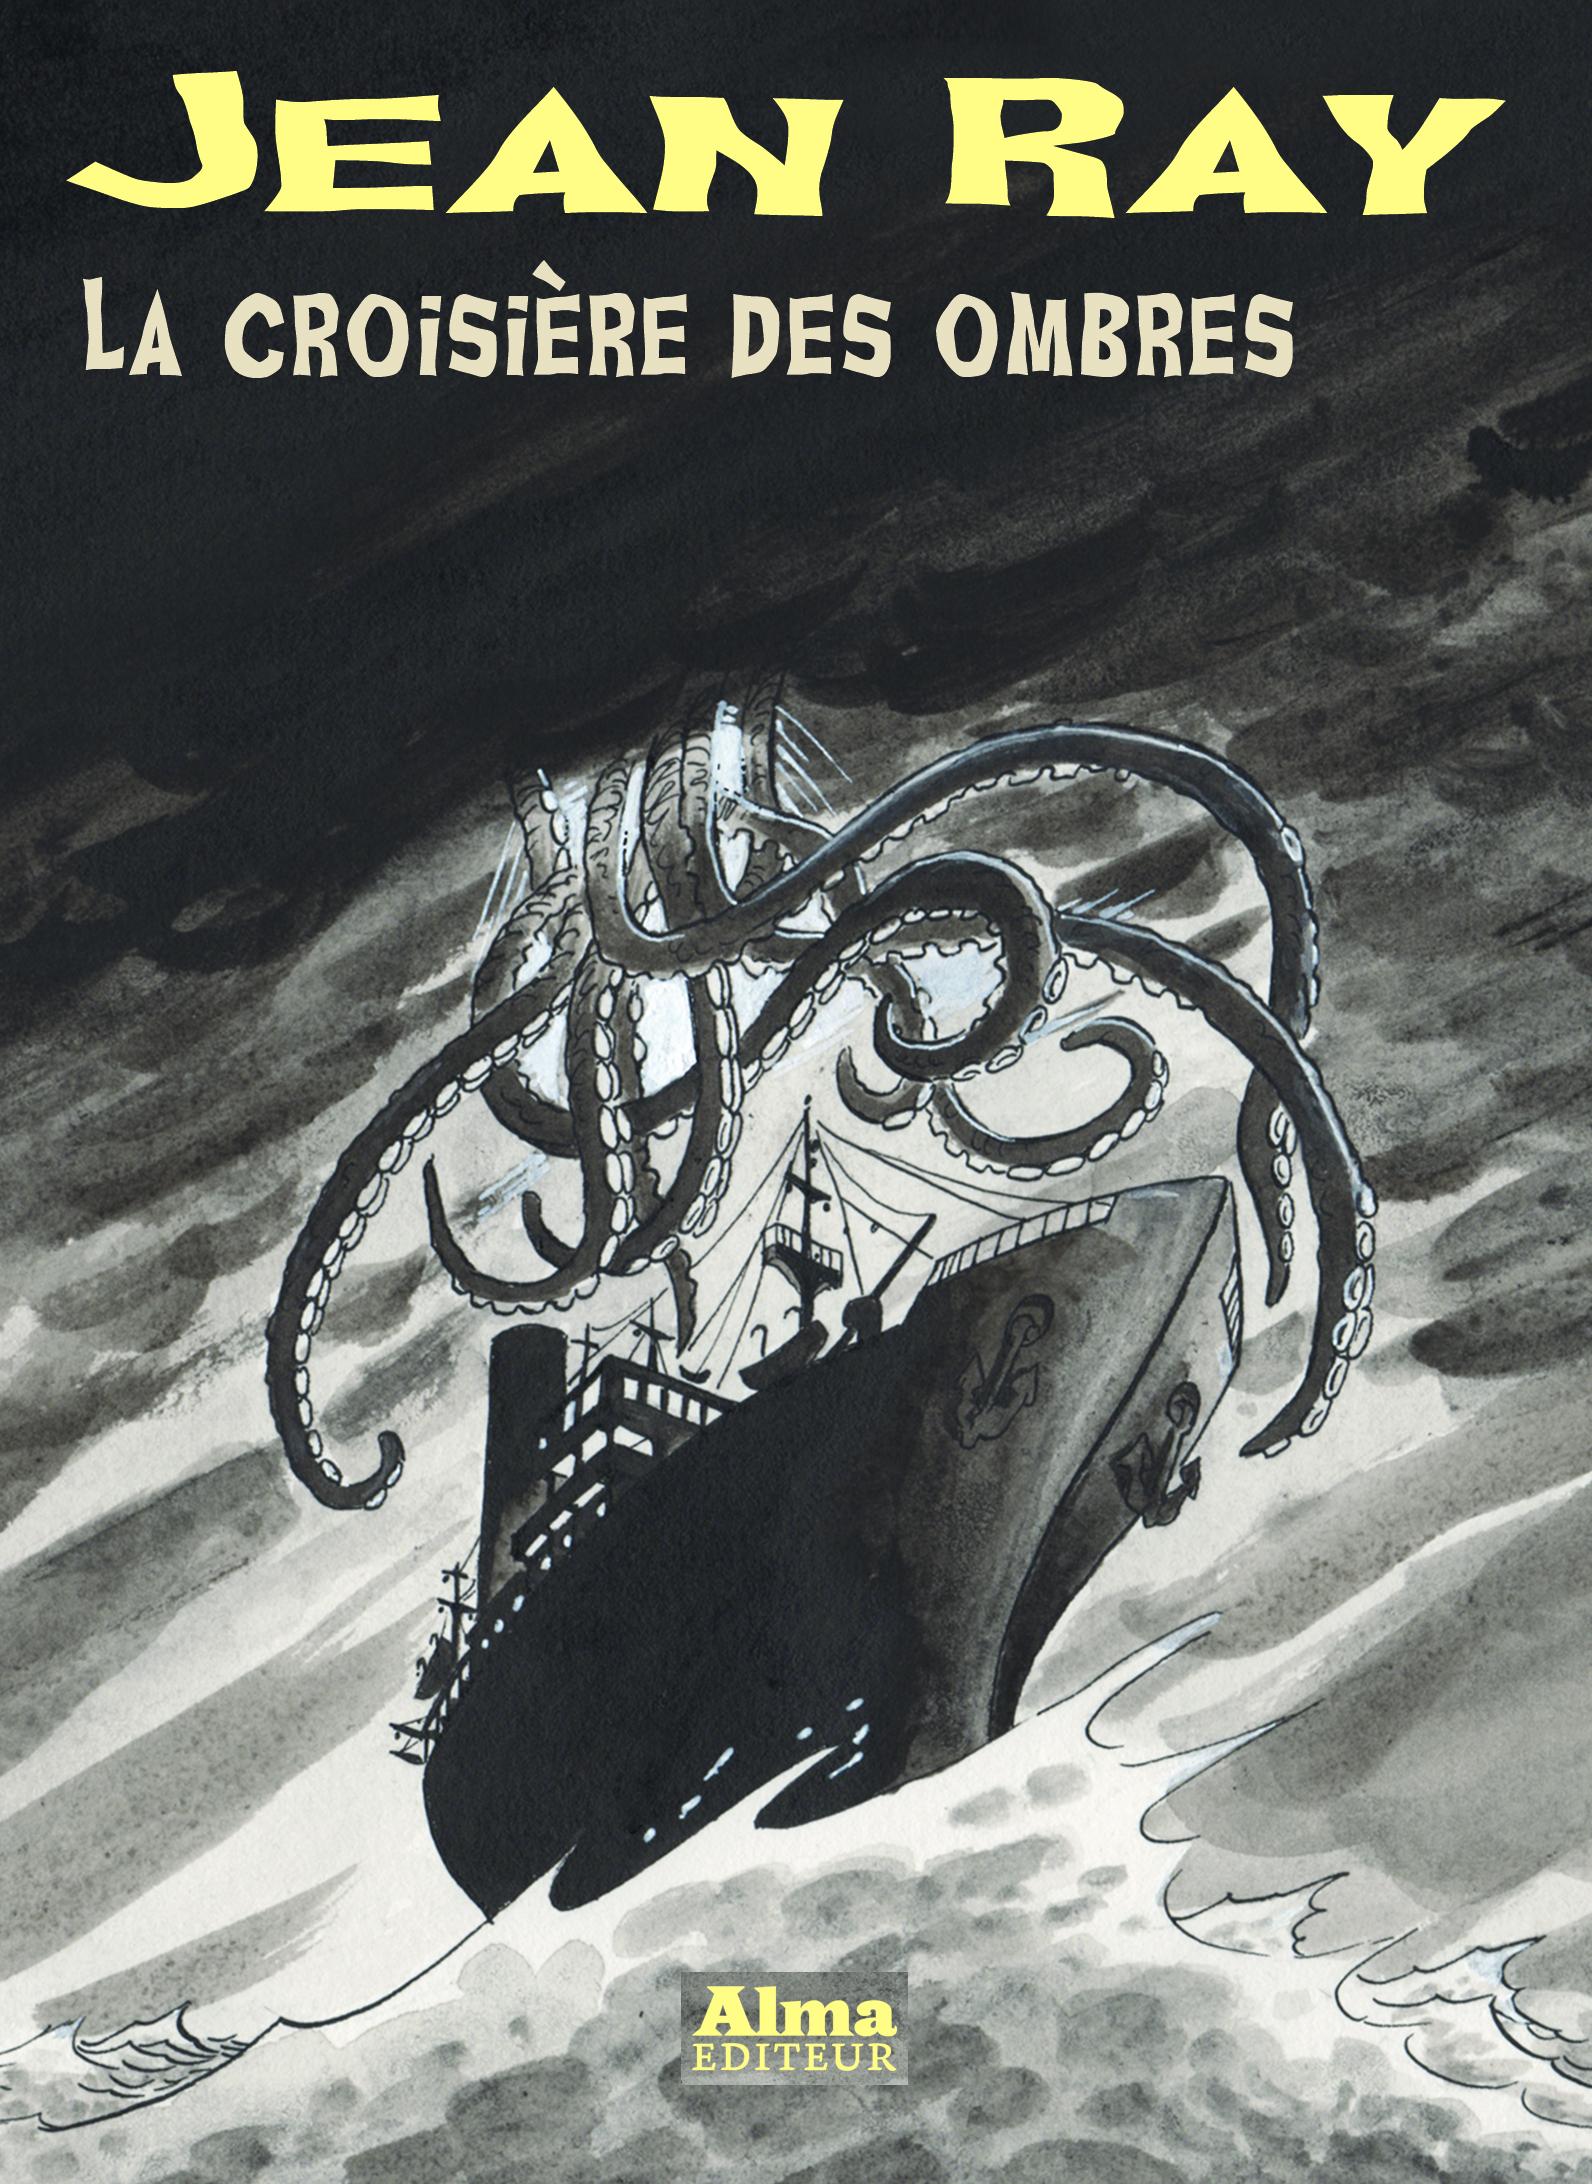 La croisière des ombres Jean Ray Mu Philippe Foerster Muriel Blondeau Alma